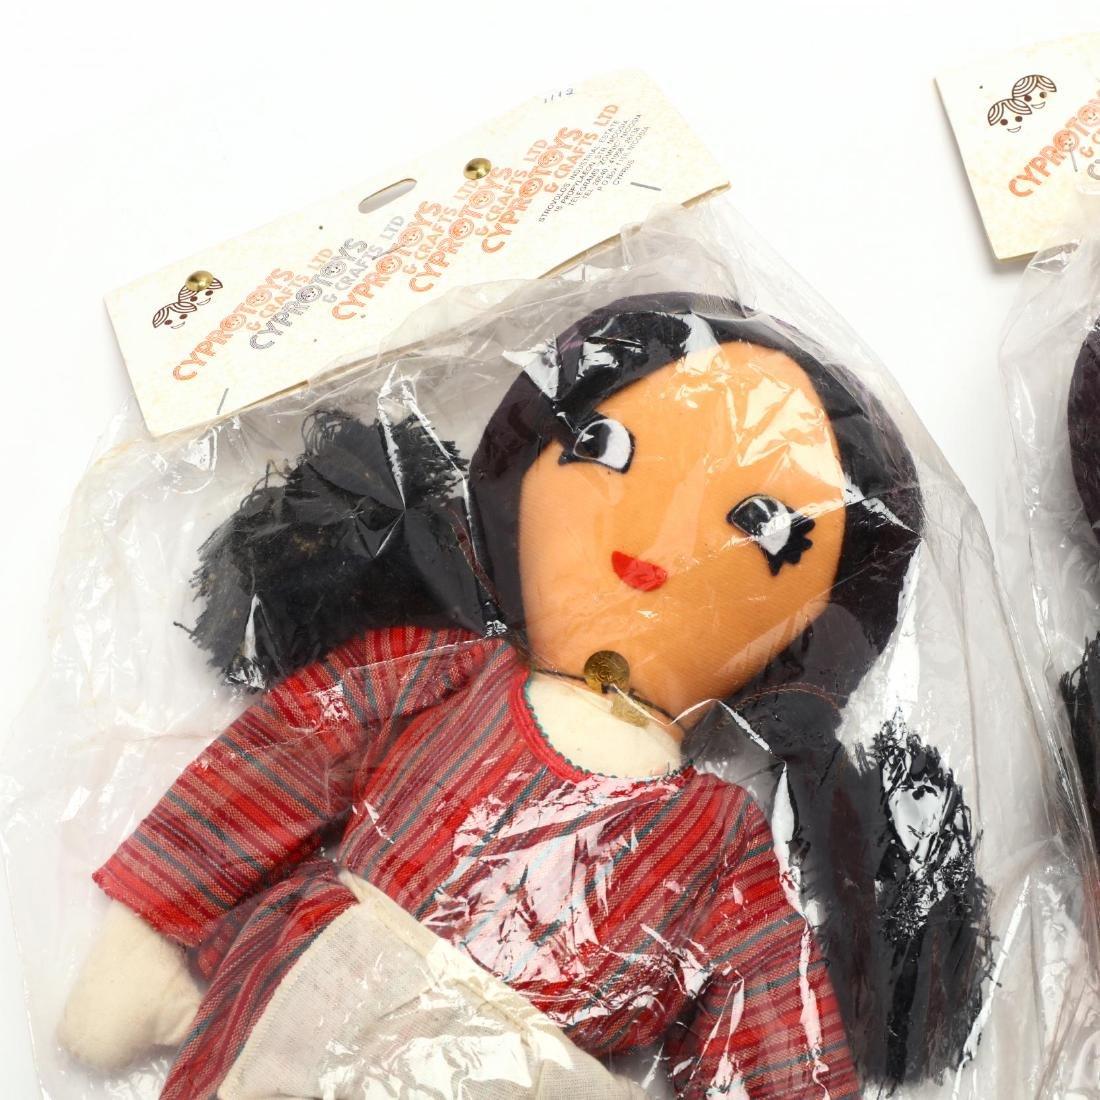 Pair of Handmade Dolls, Cyprus Crafts LTD. - 2